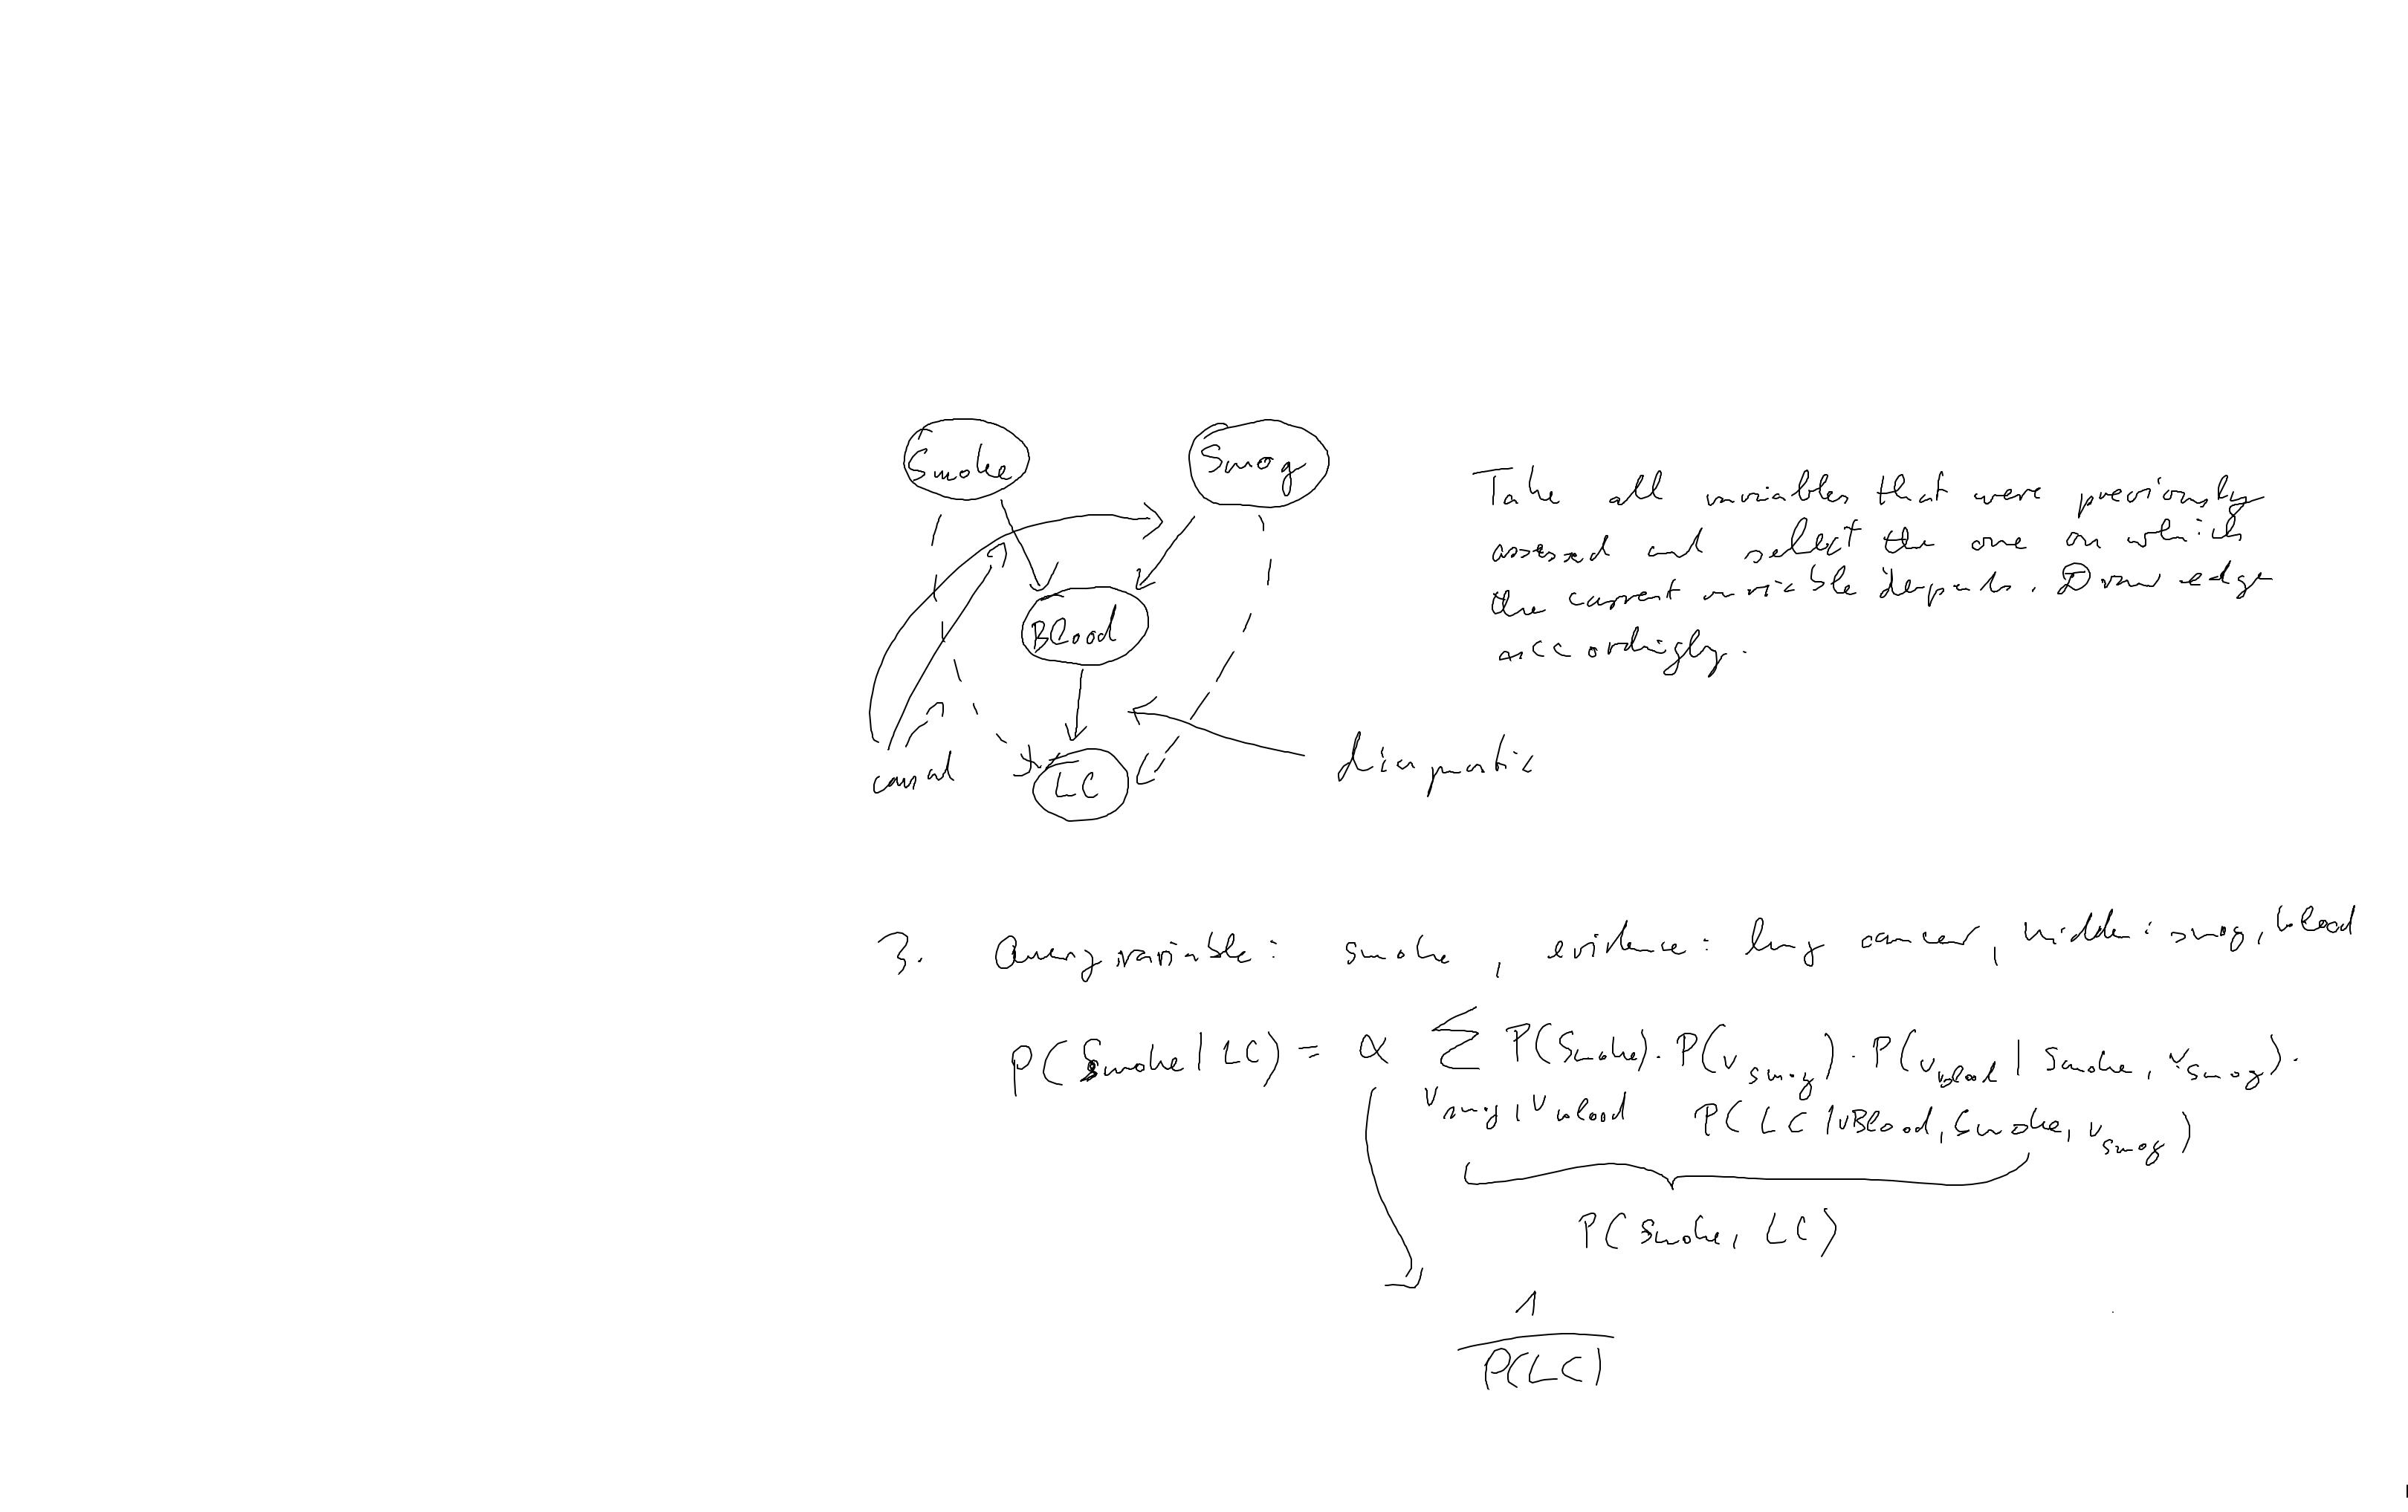 Max/AI II/2020/Tutorial IX/Whiteboard[1]-01.png